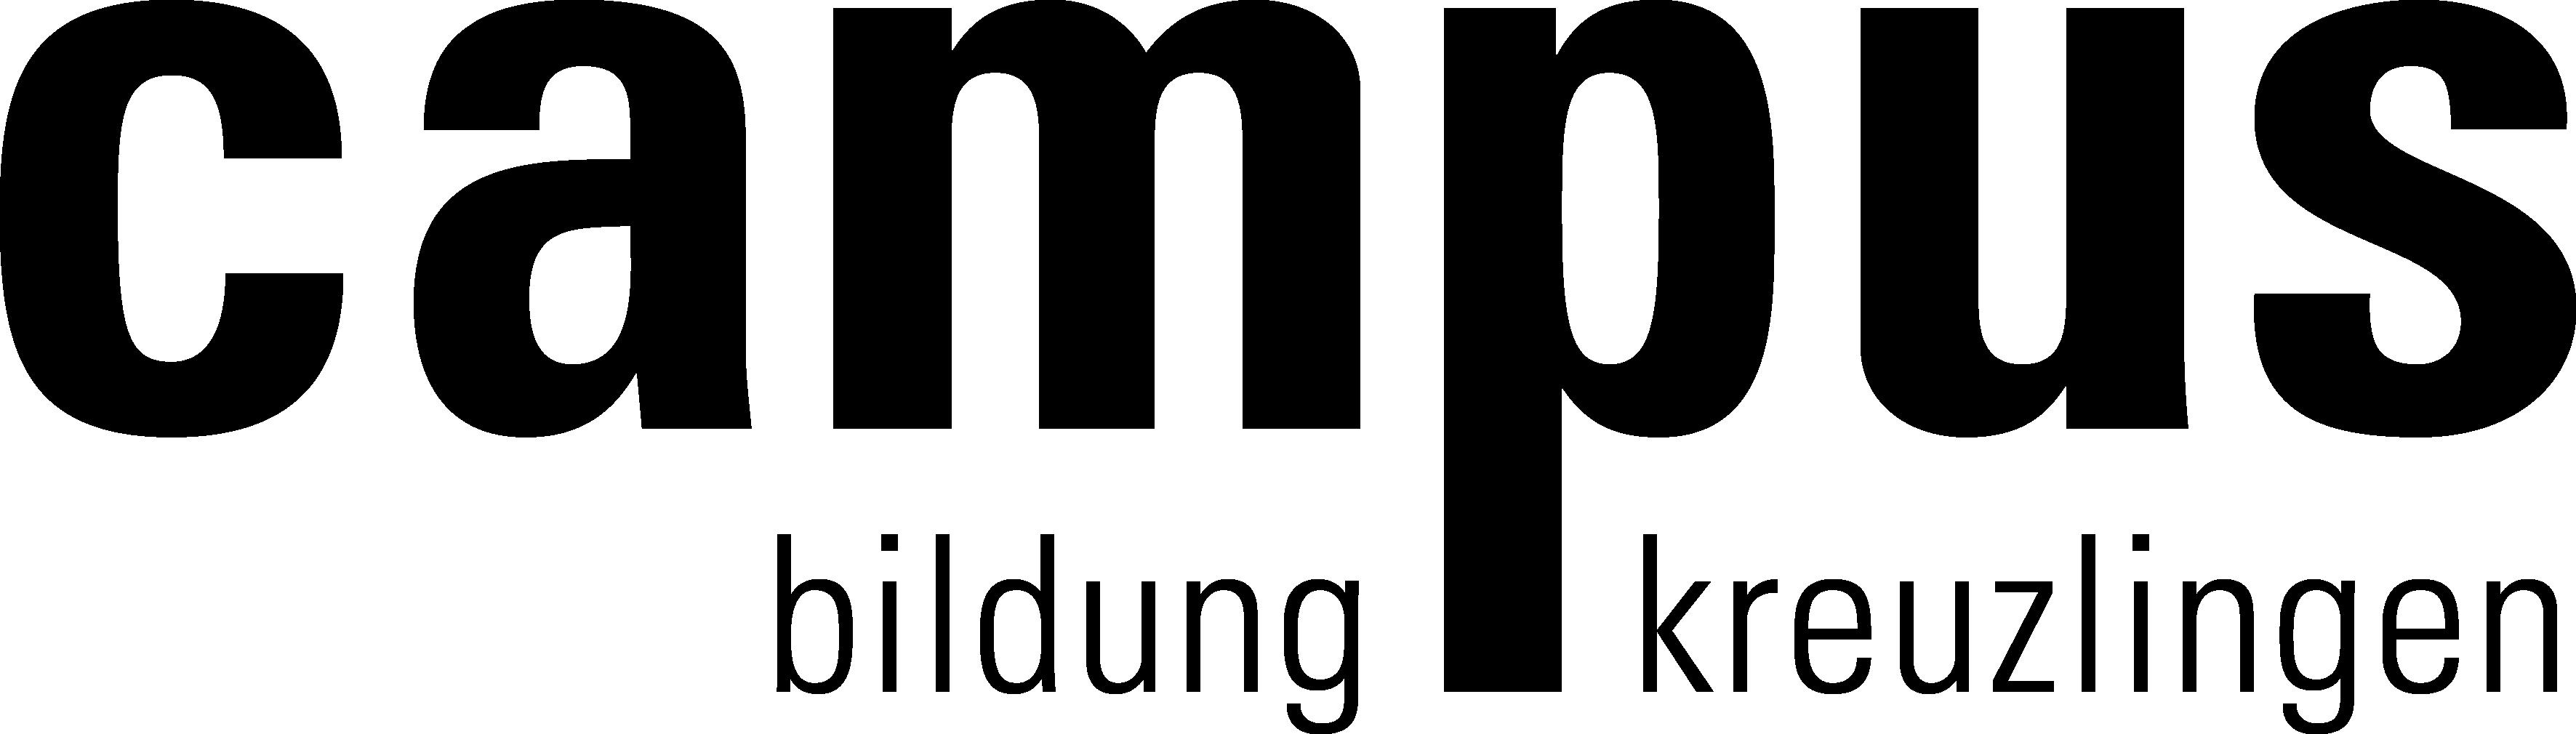 campus bildung kreuzlingen Logo